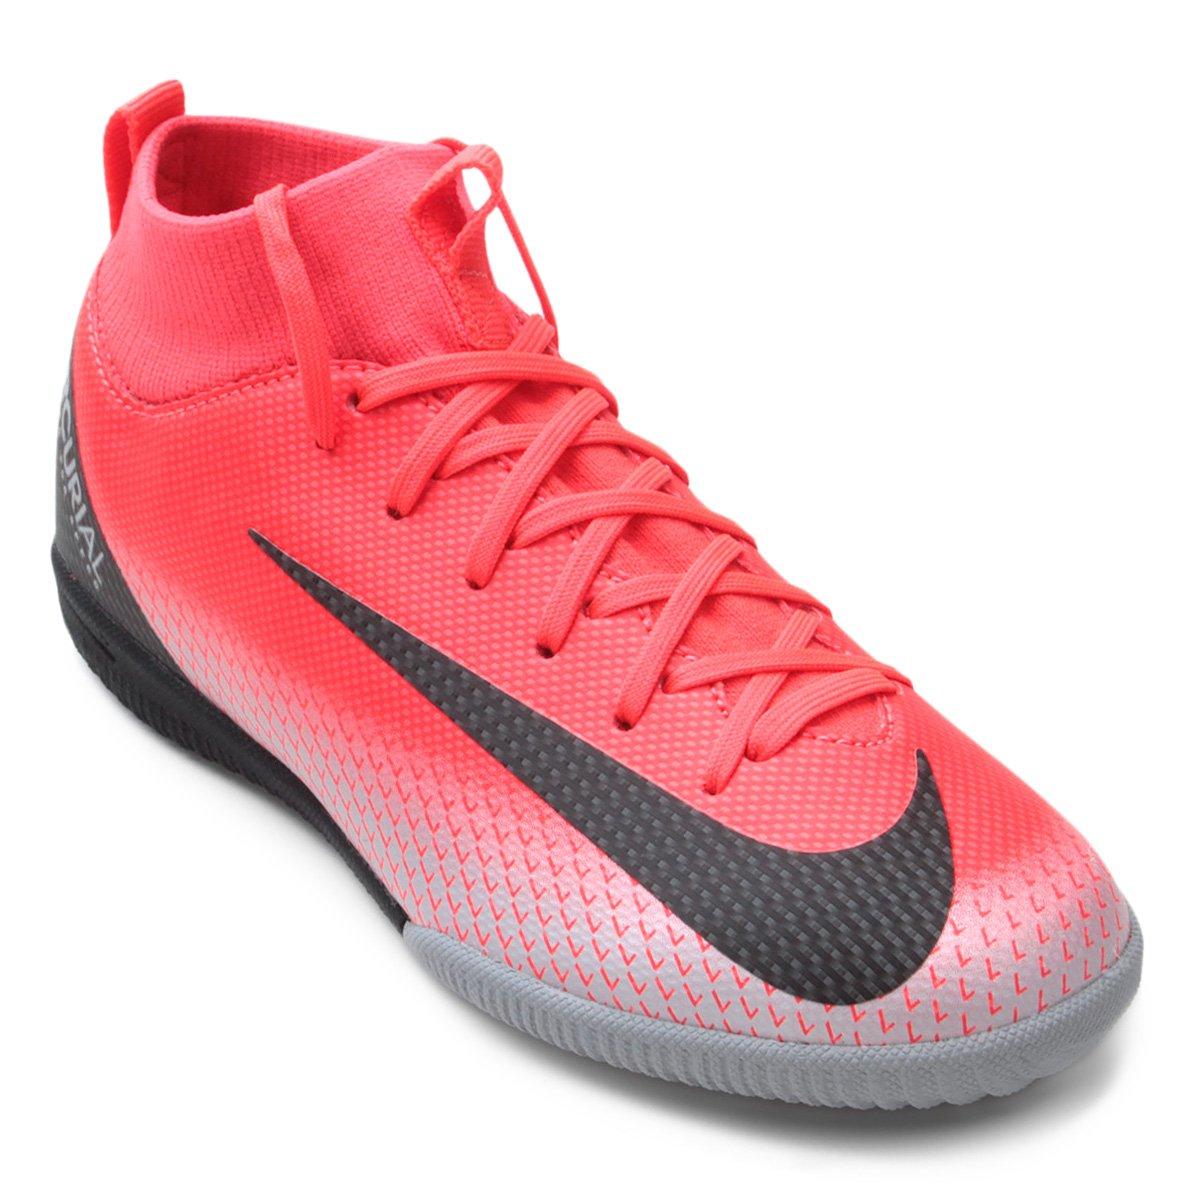 c193d4323b2 Chuteira Futsal Infantil Nike Mercurial Superfly 6 Academy GS CR7 IC -  Preto e Cinza - Compre Agora